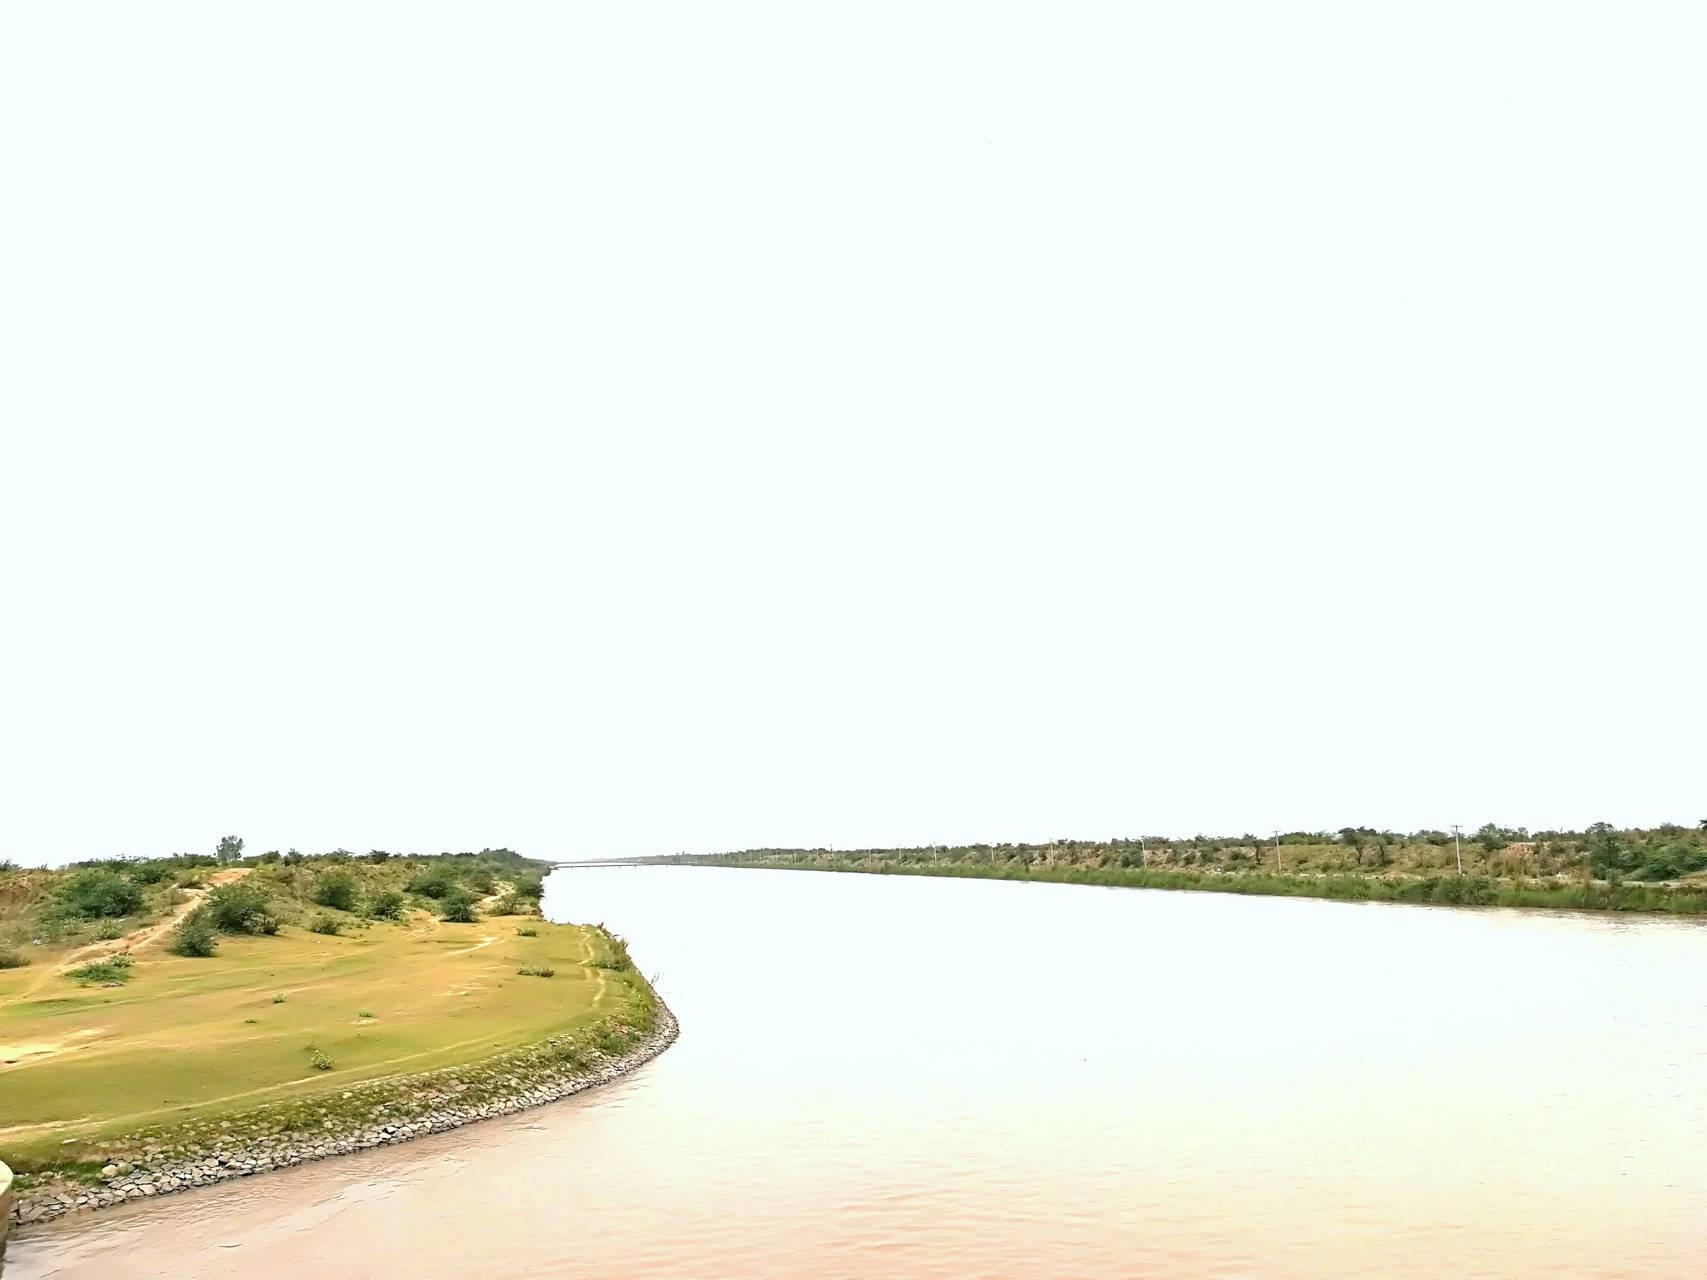 River had sagar